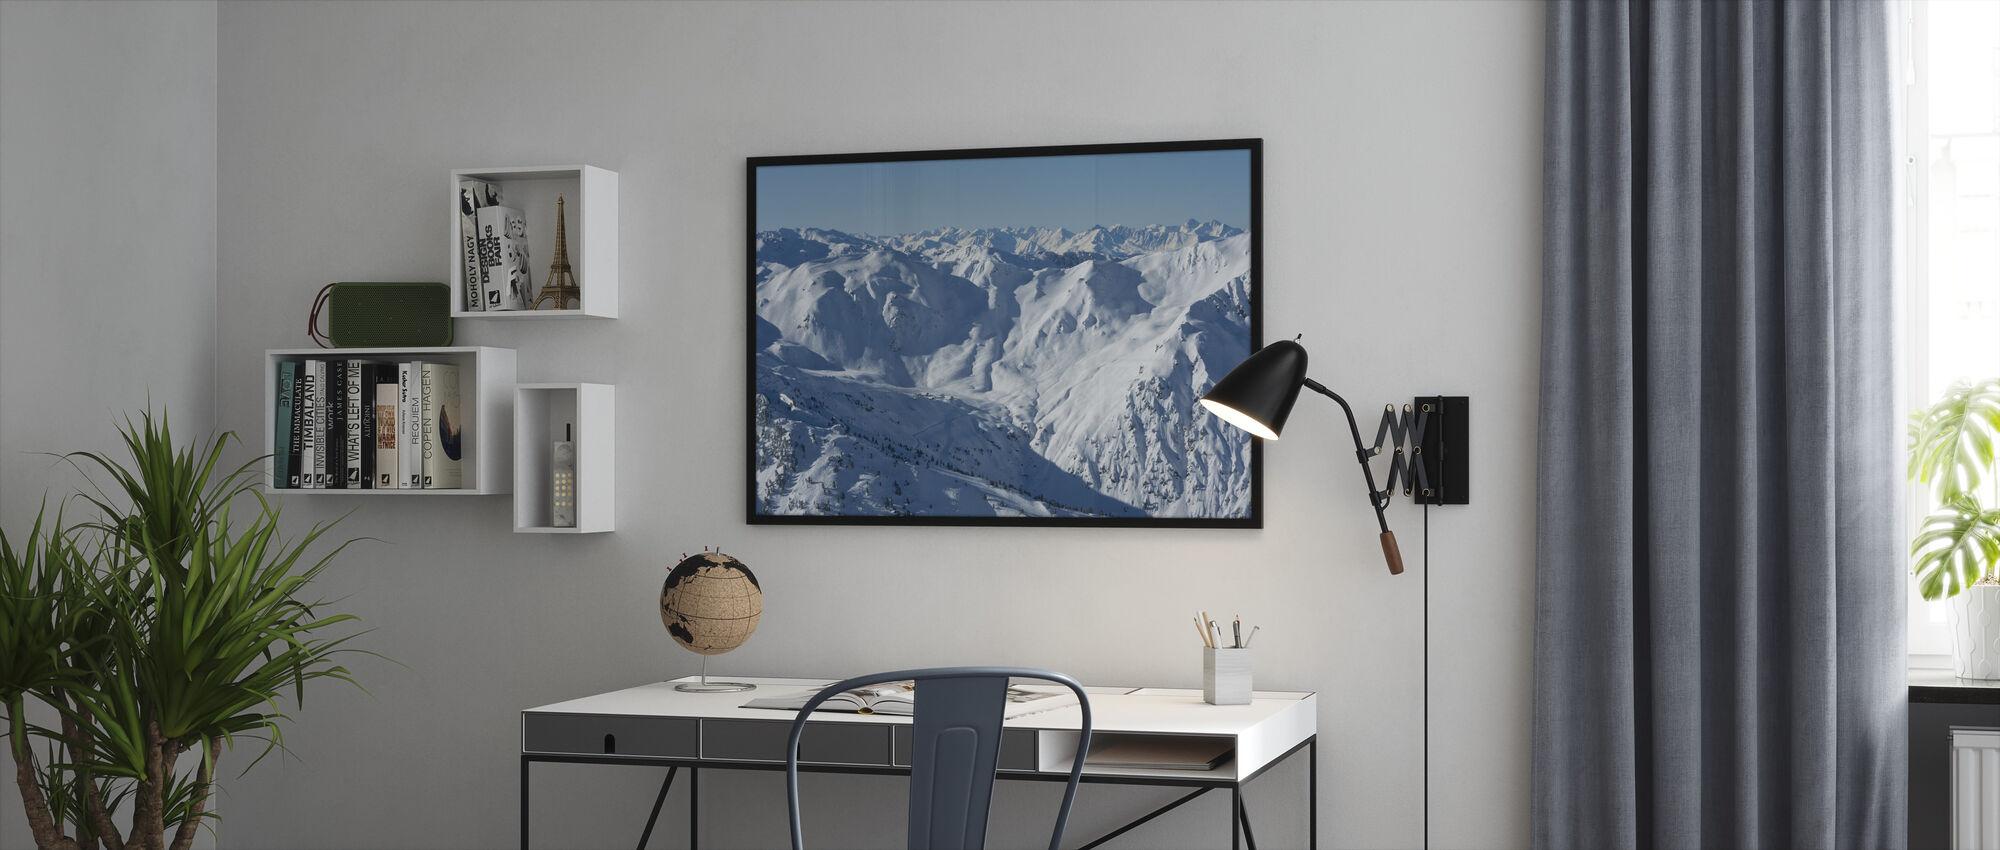 Ski Slopes of Zillertal - Framed print - Office